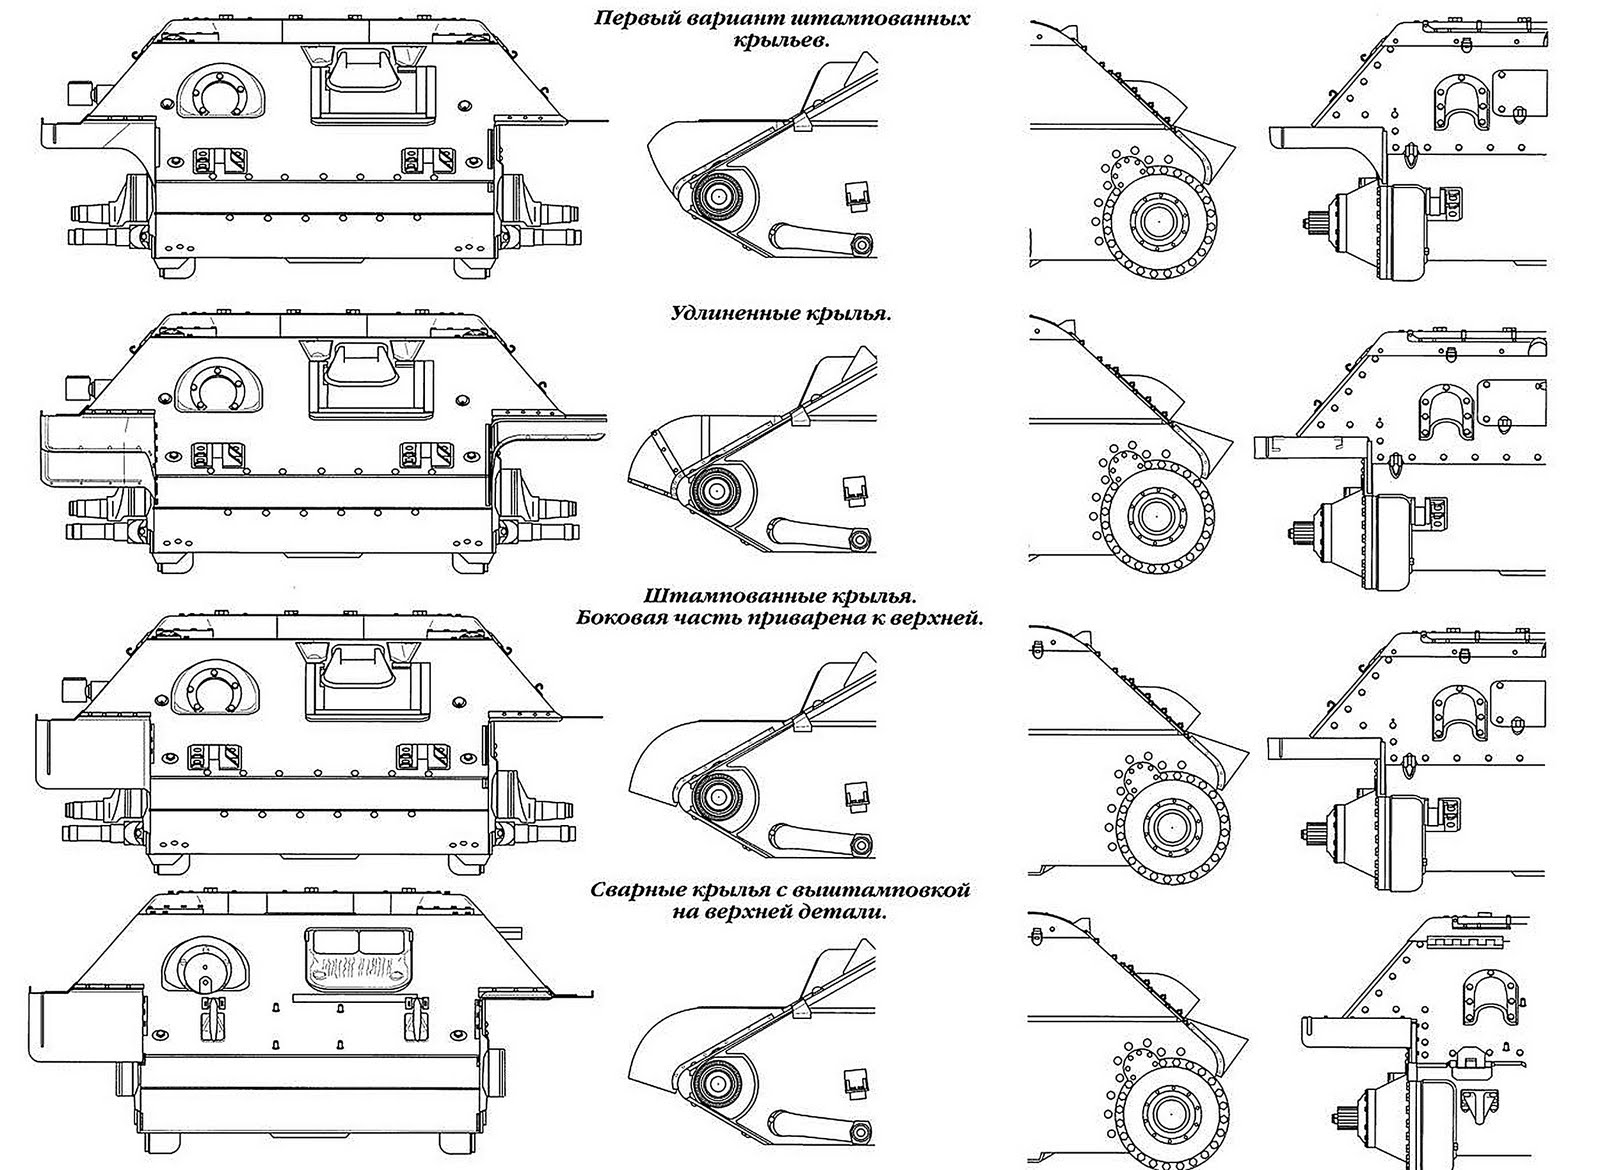 танк т-34 схема